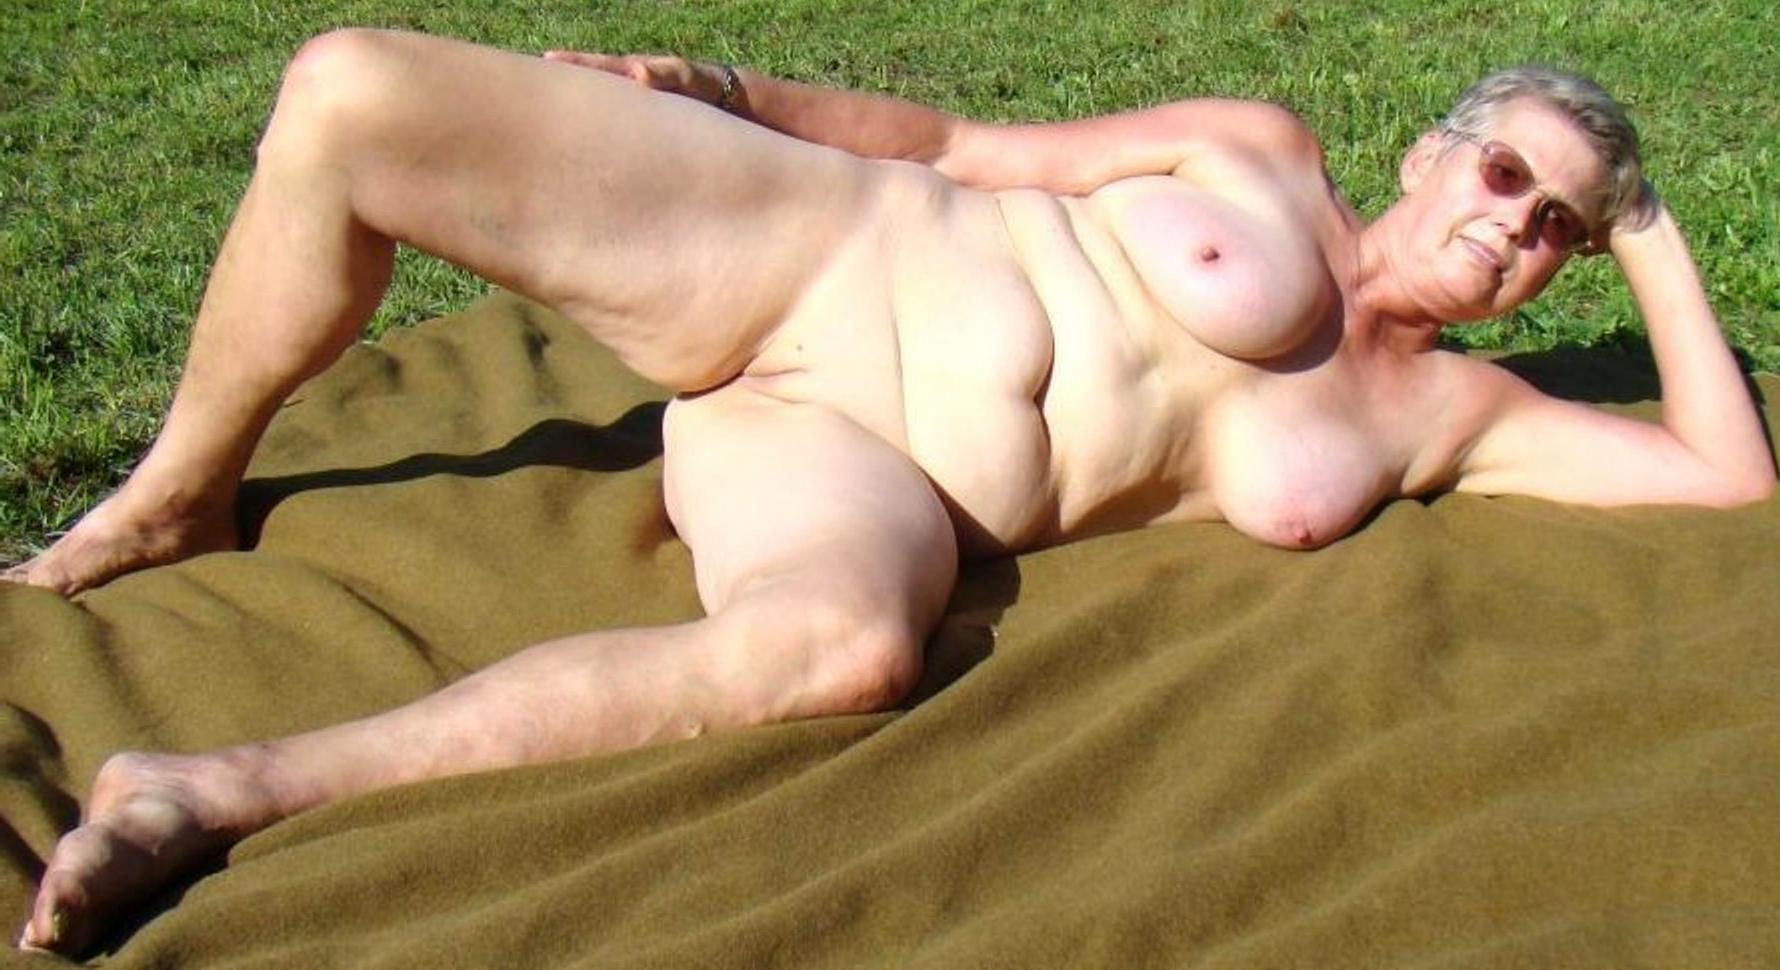 old women nude photos